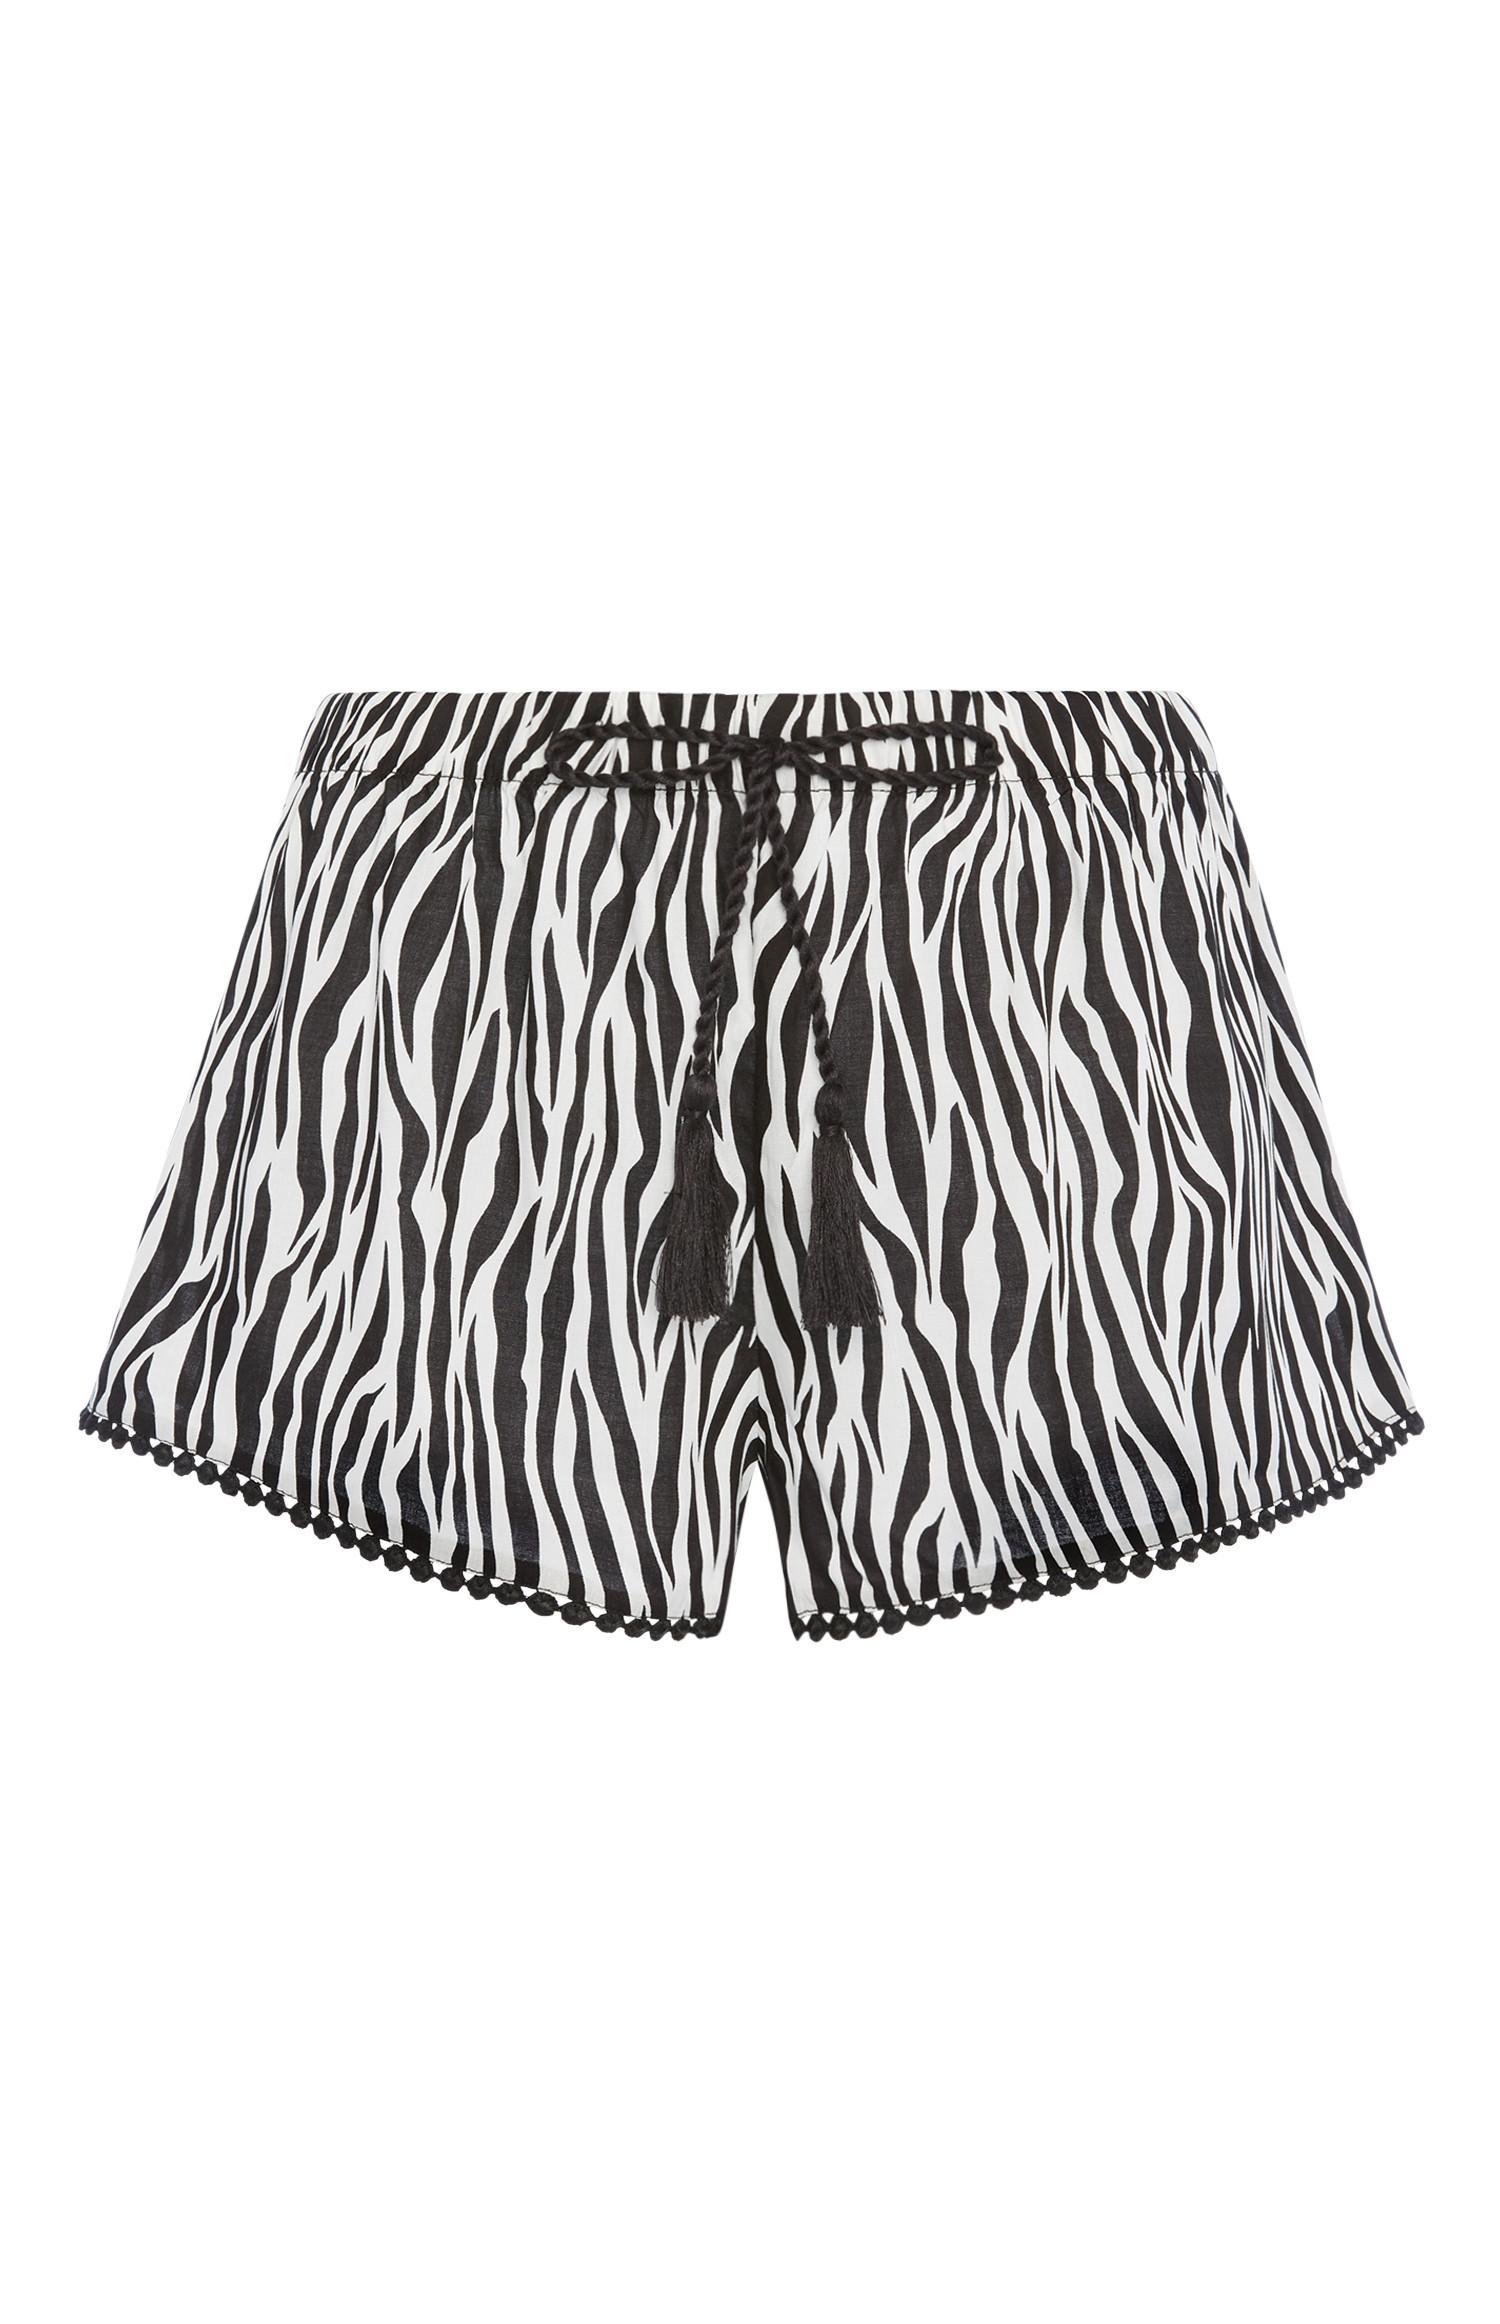 Zebra Print Short